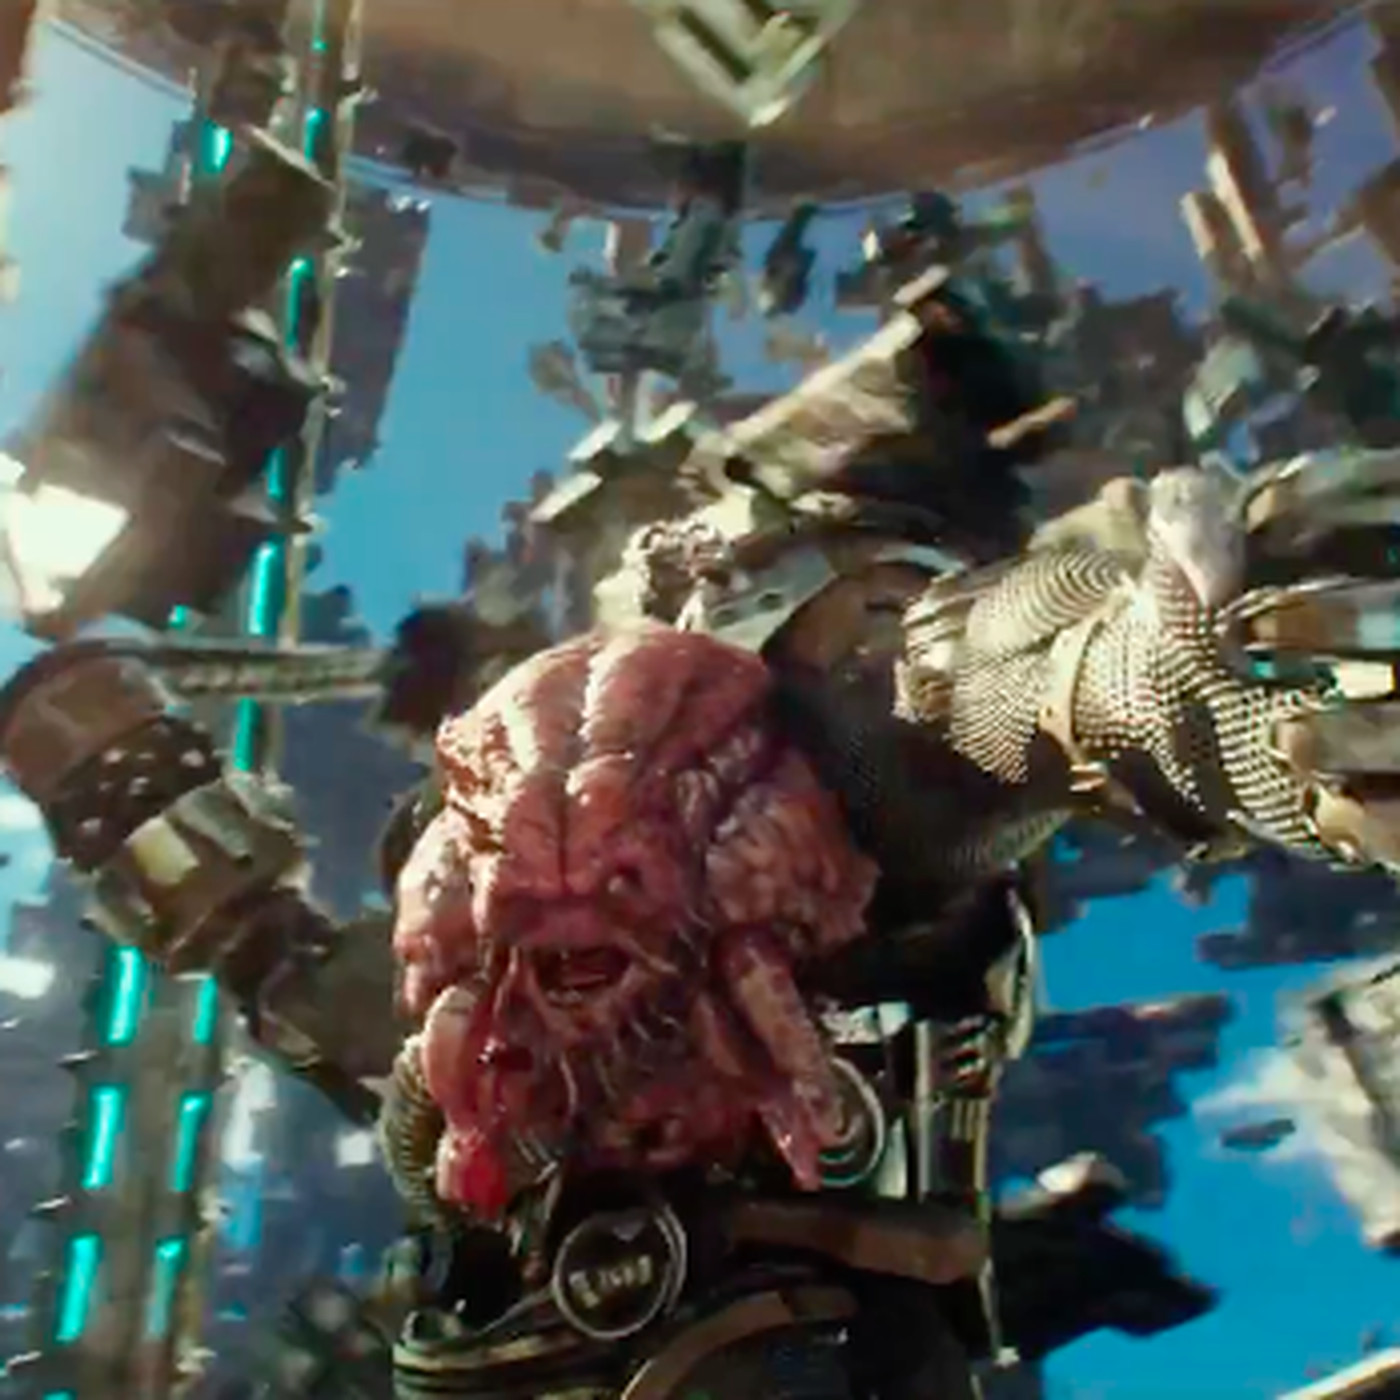 The Latest Trailer For Teenage Mutant Ninja Turtles 2 Finally Unleashes Krang The Verge